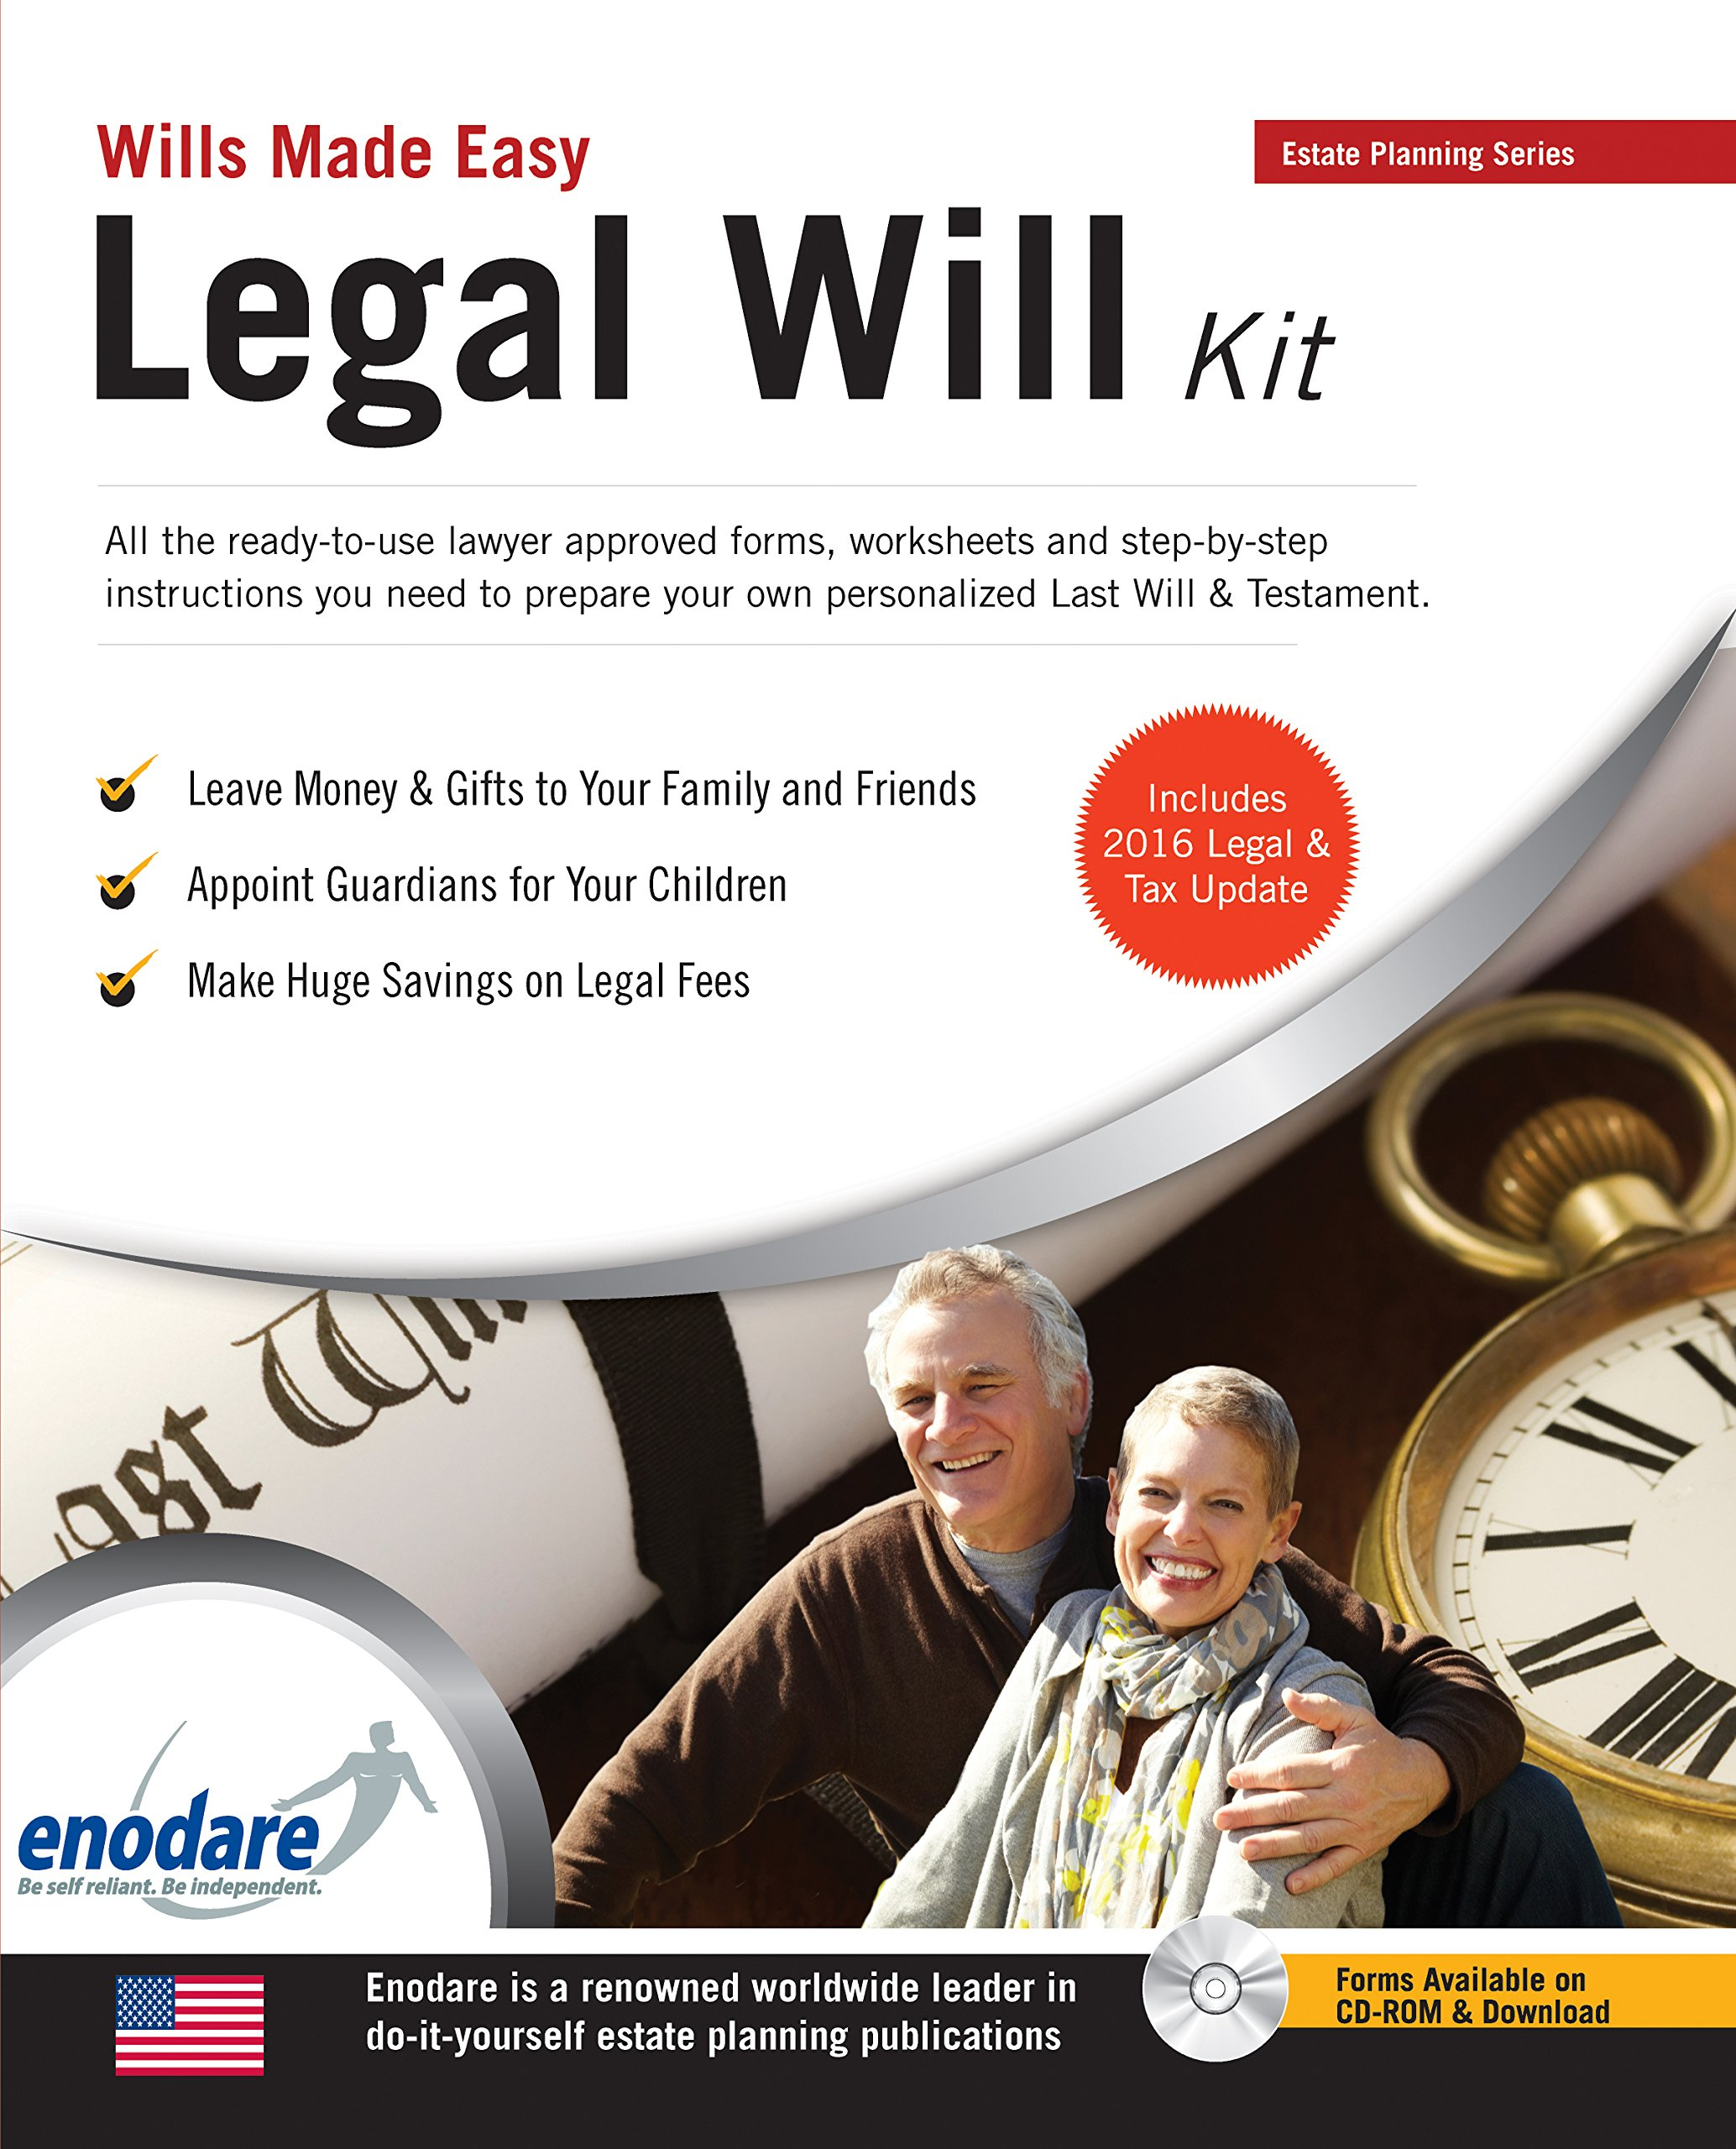 Legal will kit wills made easy amazon enodare legal will kit wills made easy amazon enodare 9781906144975 books solutioingenieria Images